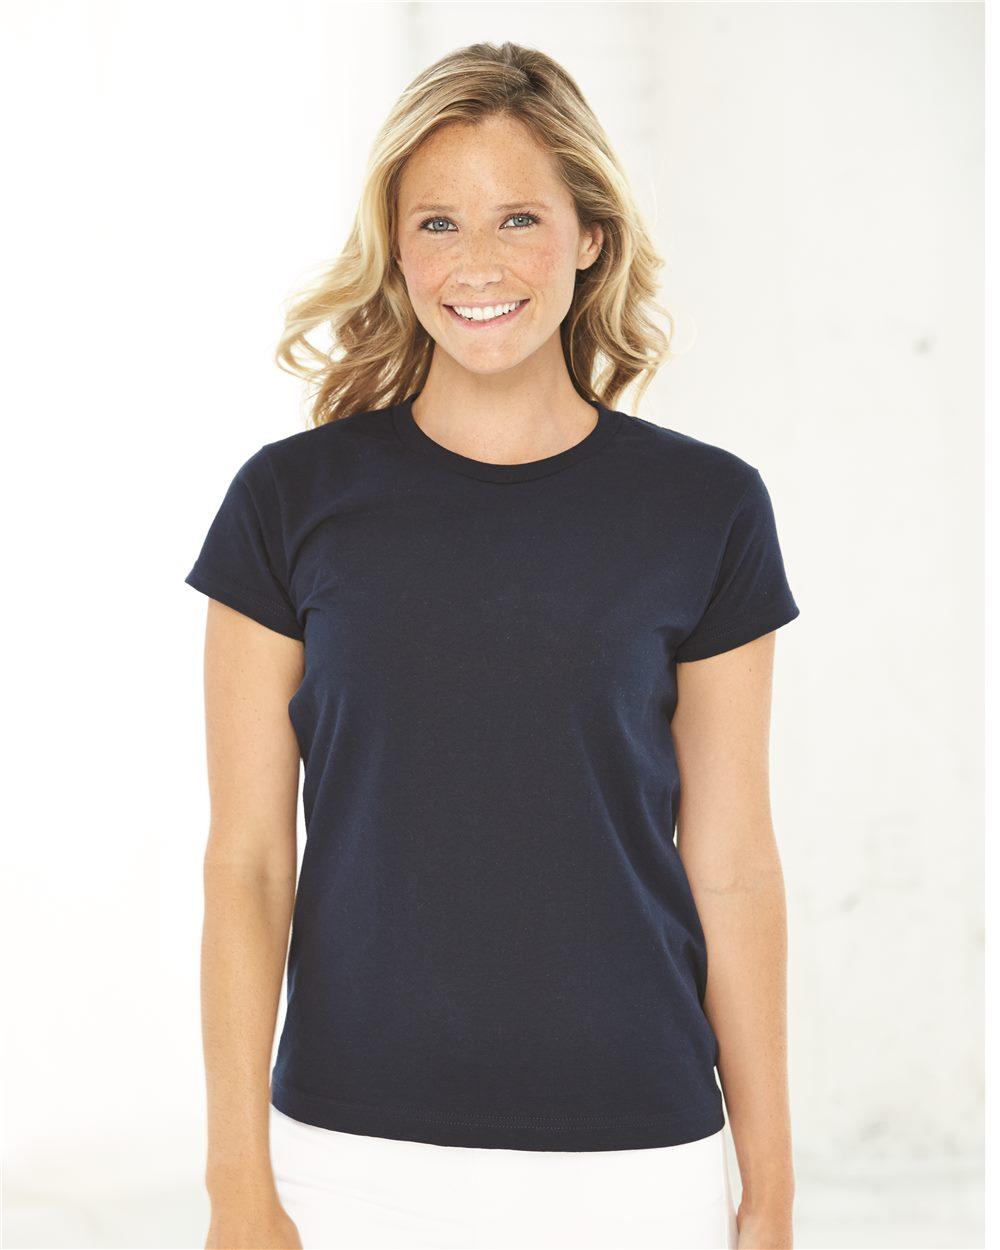 Bayside 3325 - Ladies' USA Made Short Sleeve Shirt